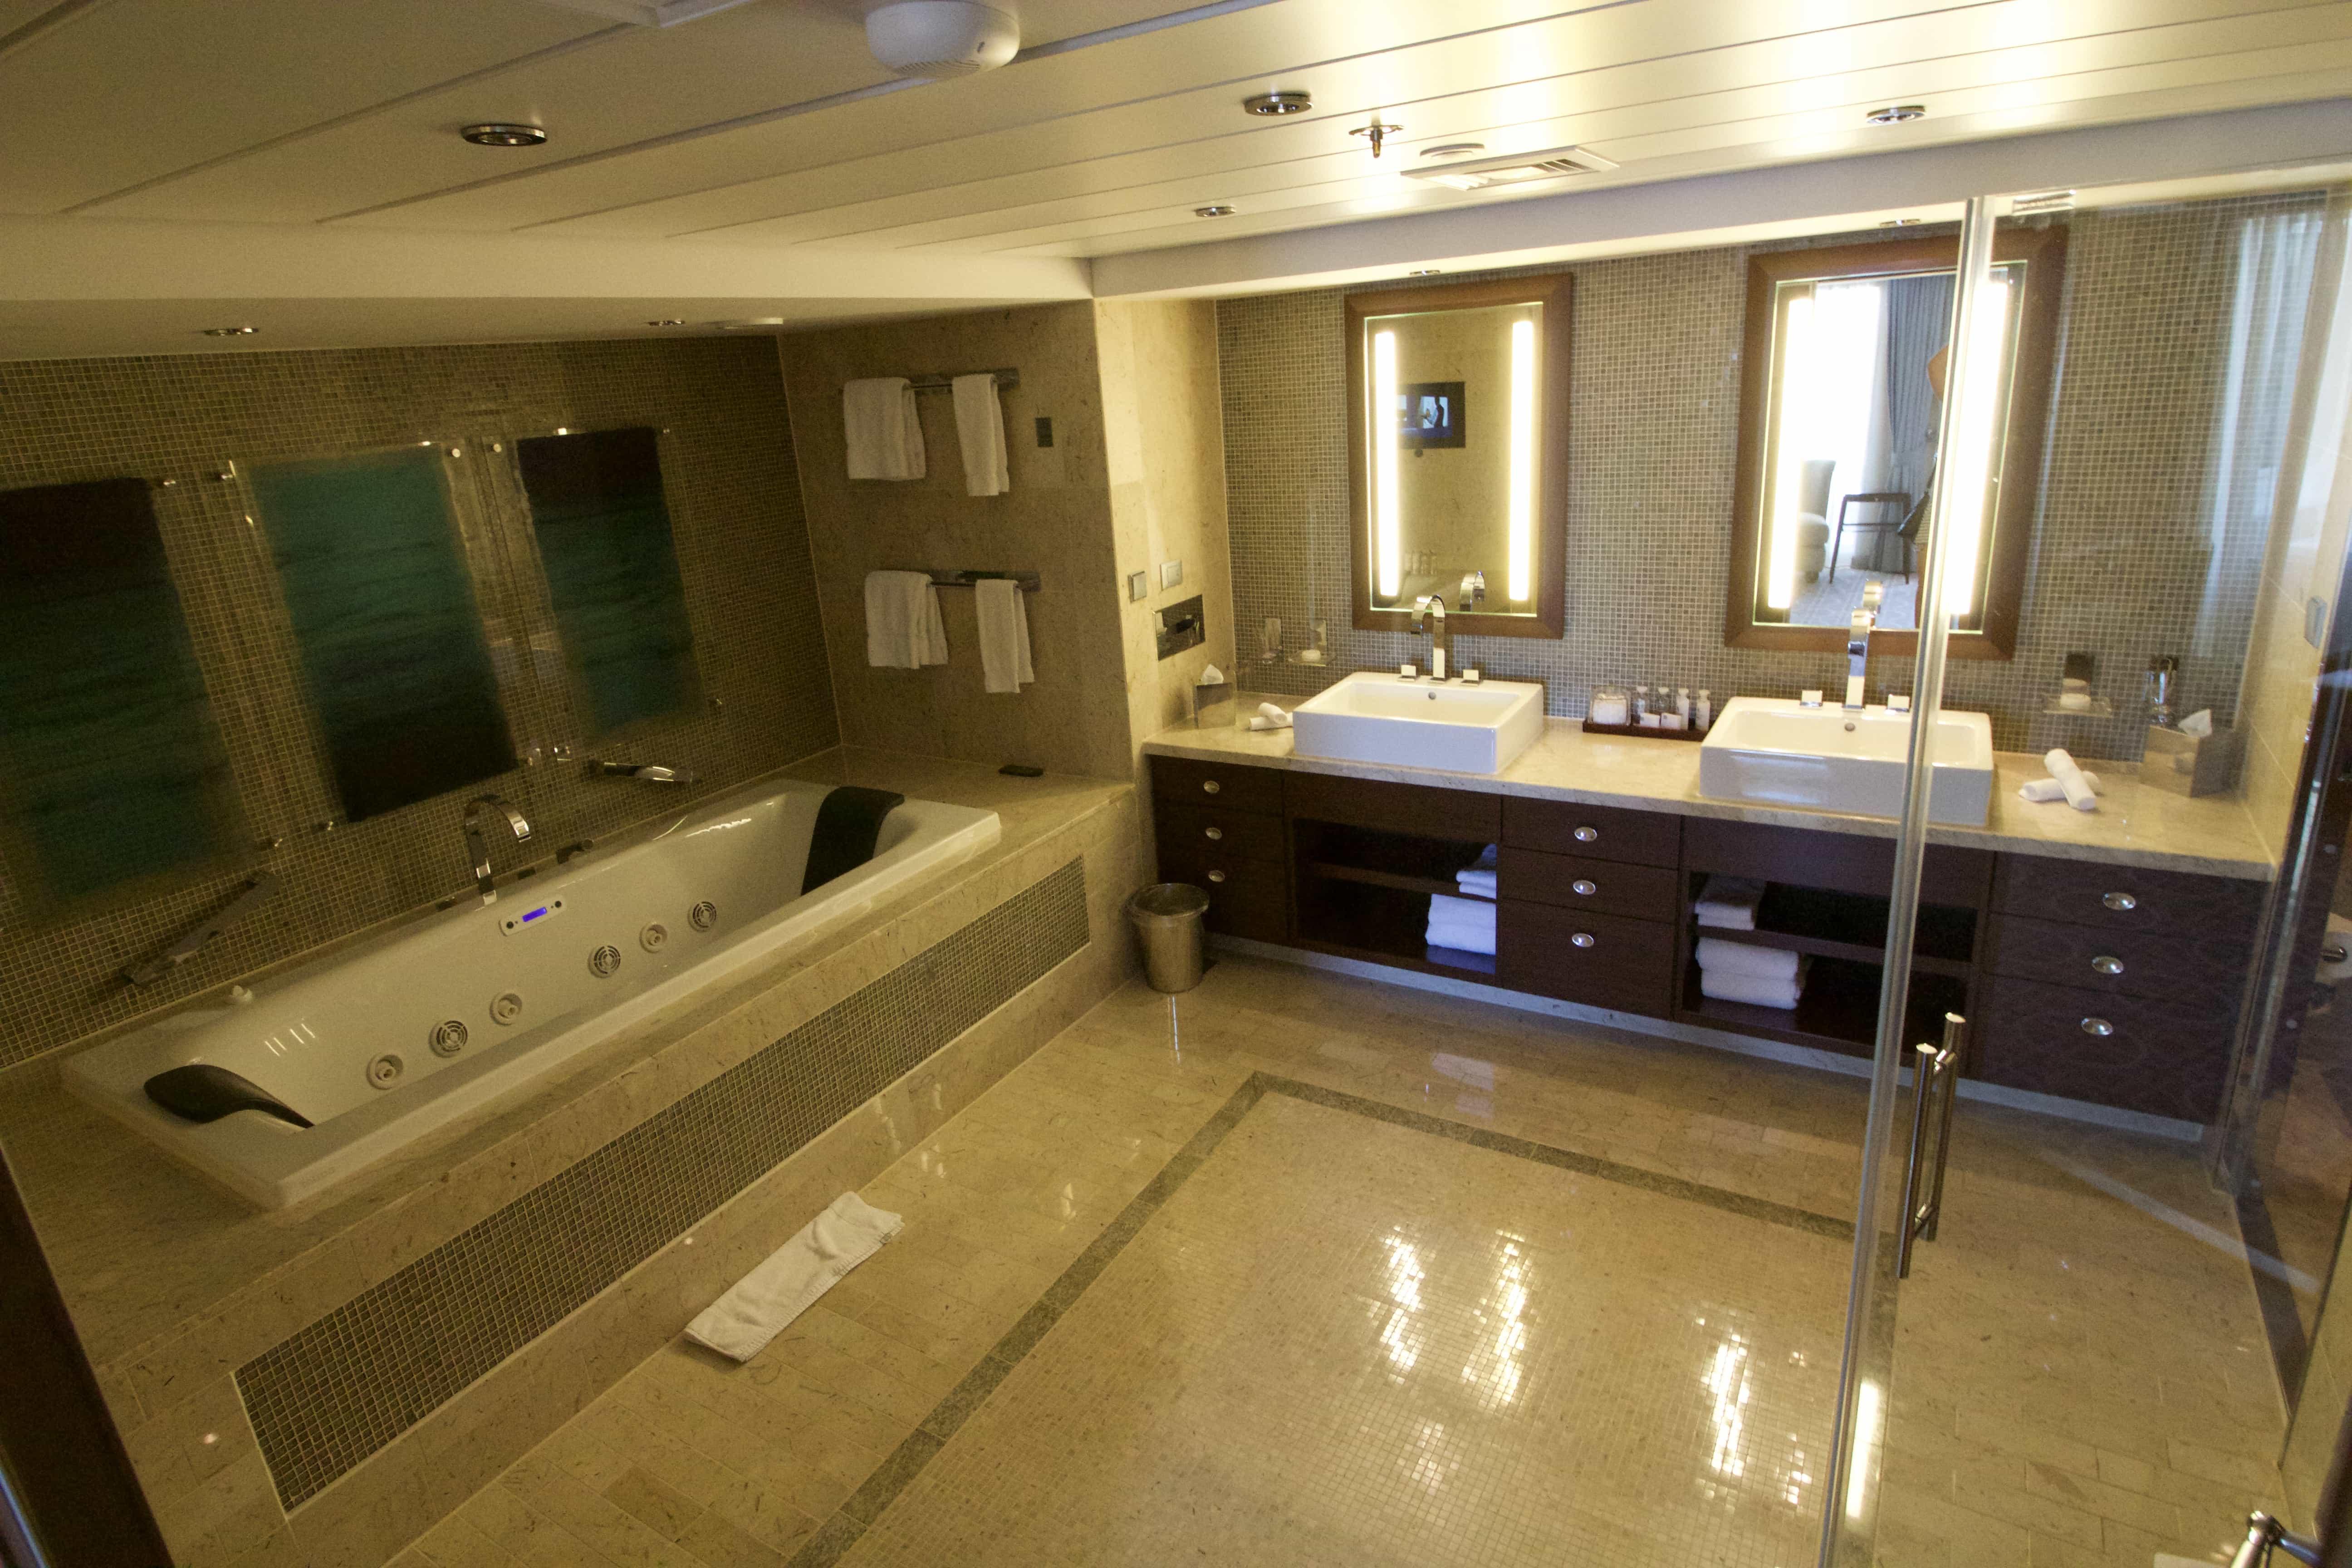 Celebrity Eclipse - Penthouse Suite, Bathroom bath double sinks showers luxury